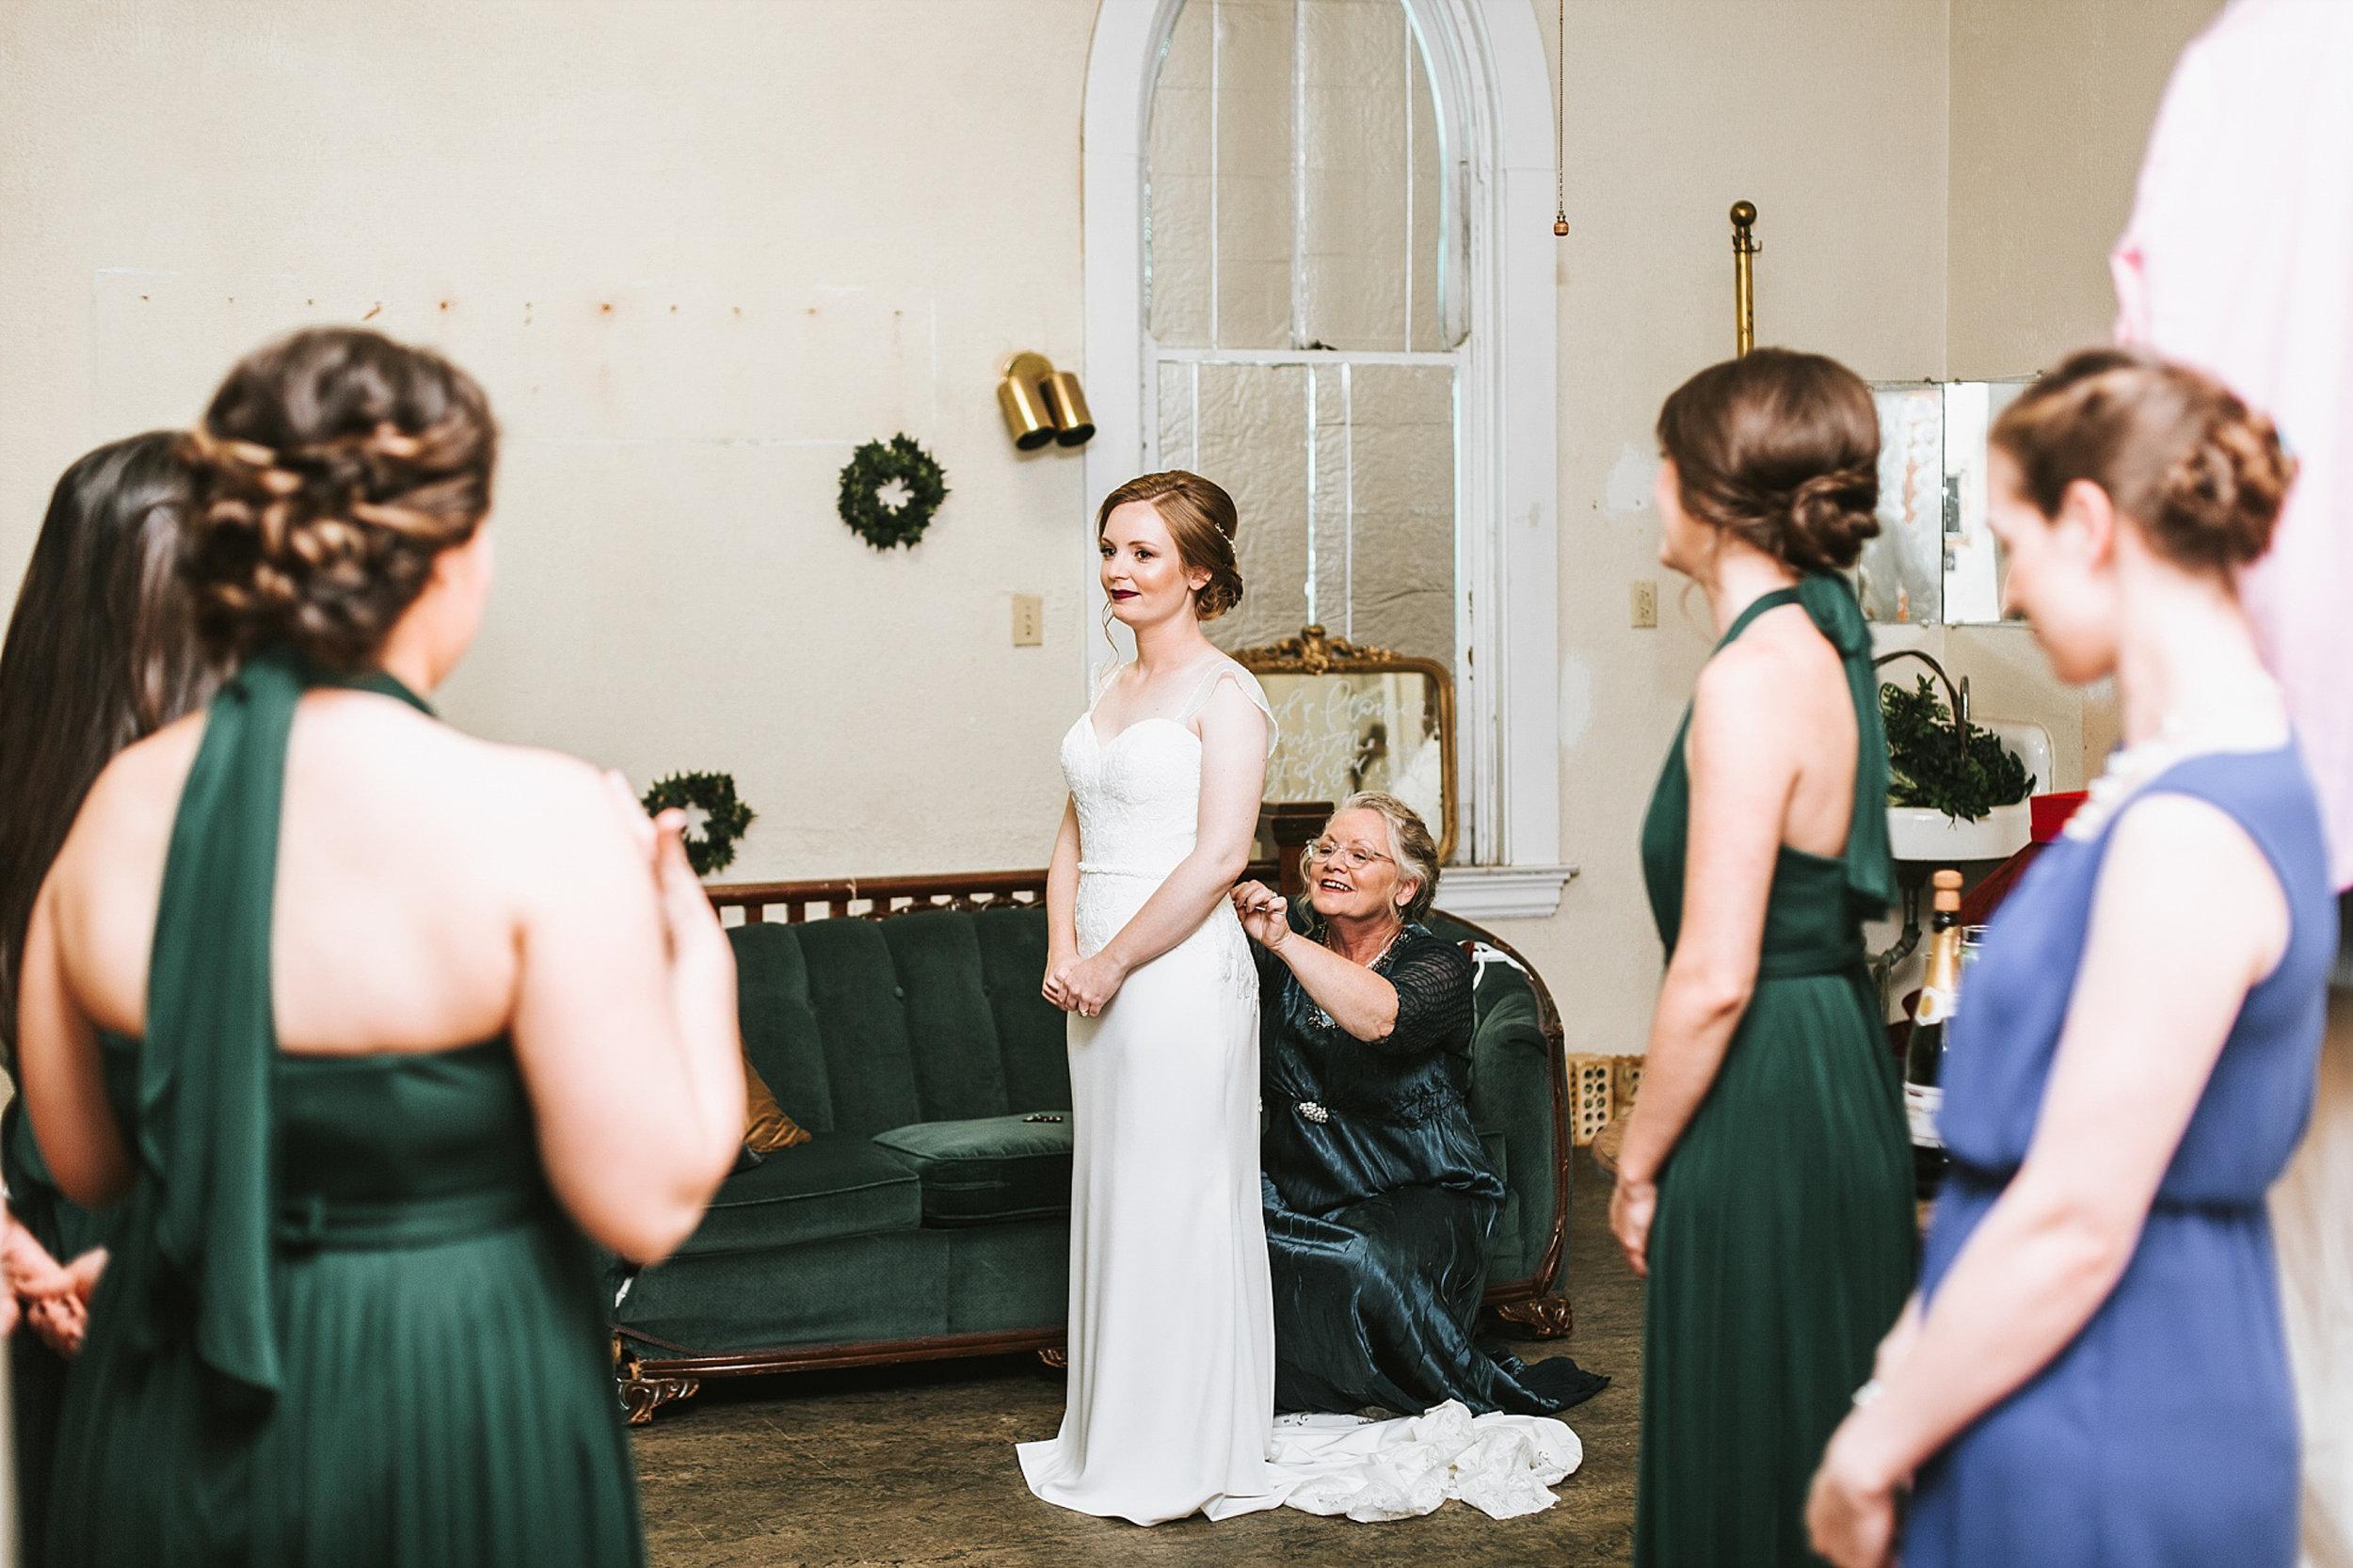 Brooke Townsend Photography - Ohio Wedding Photographer-25.jpg